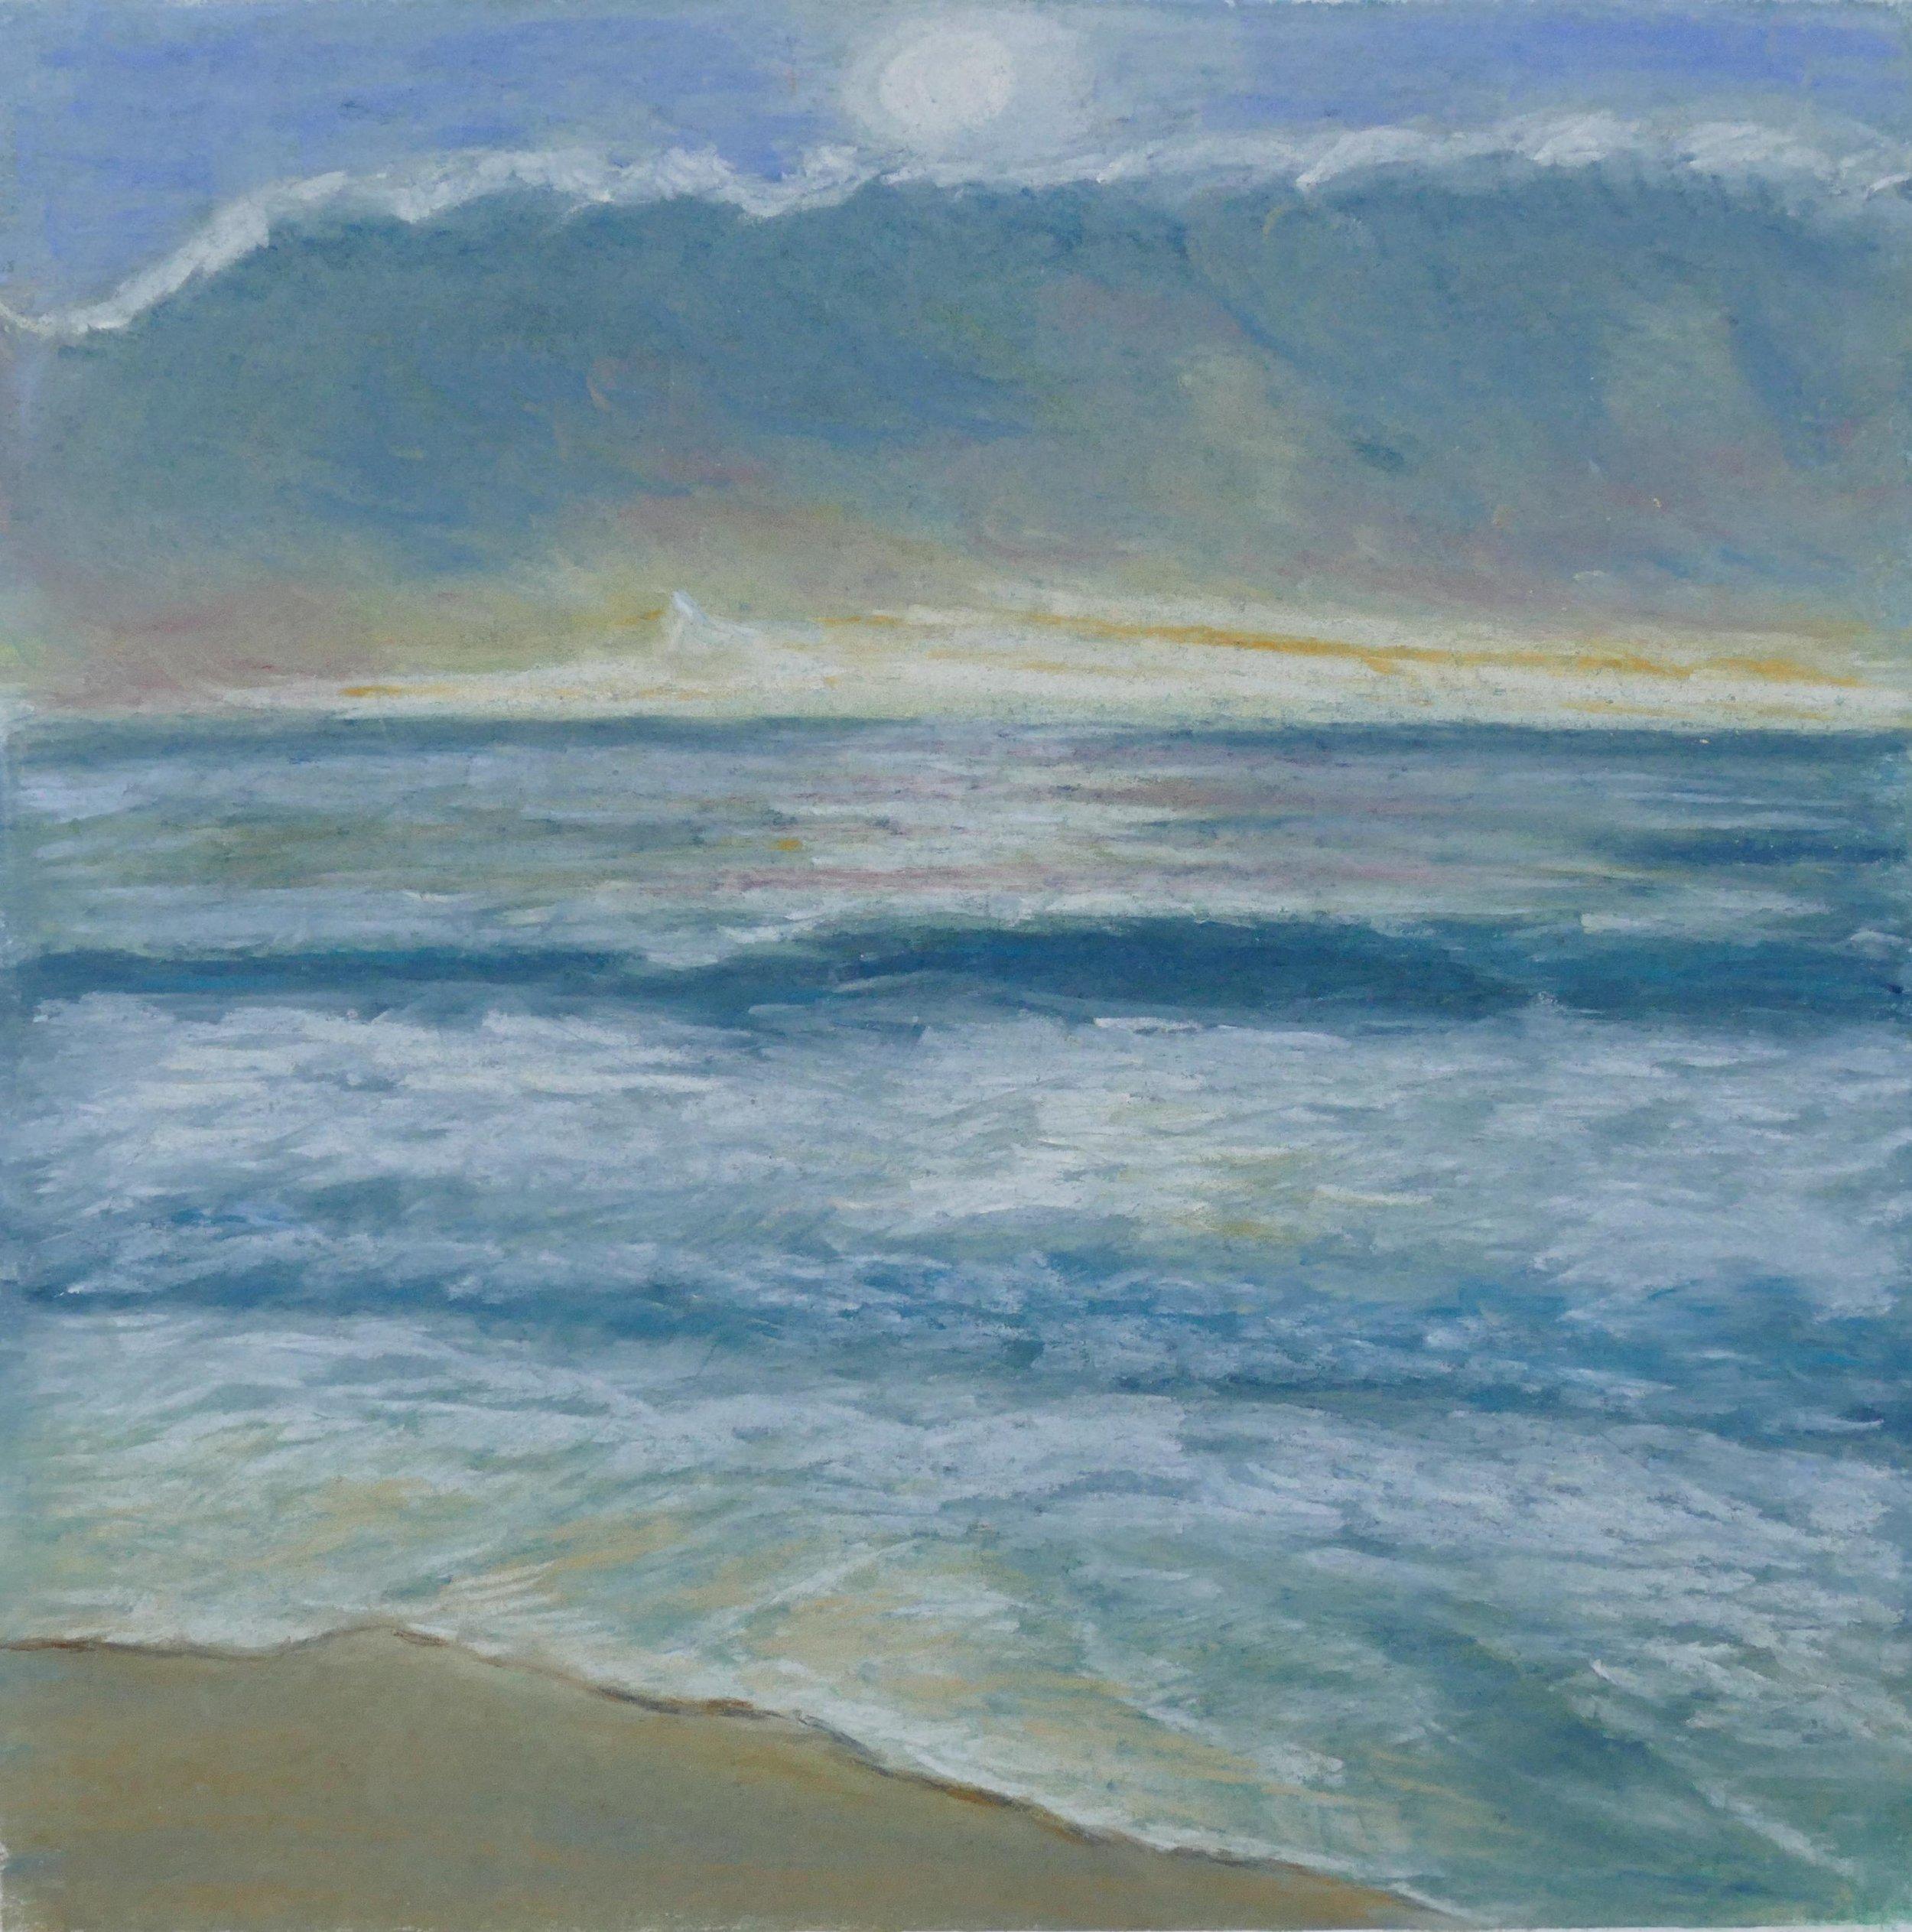 Print 19 - The Beach - Size: 269 x 268